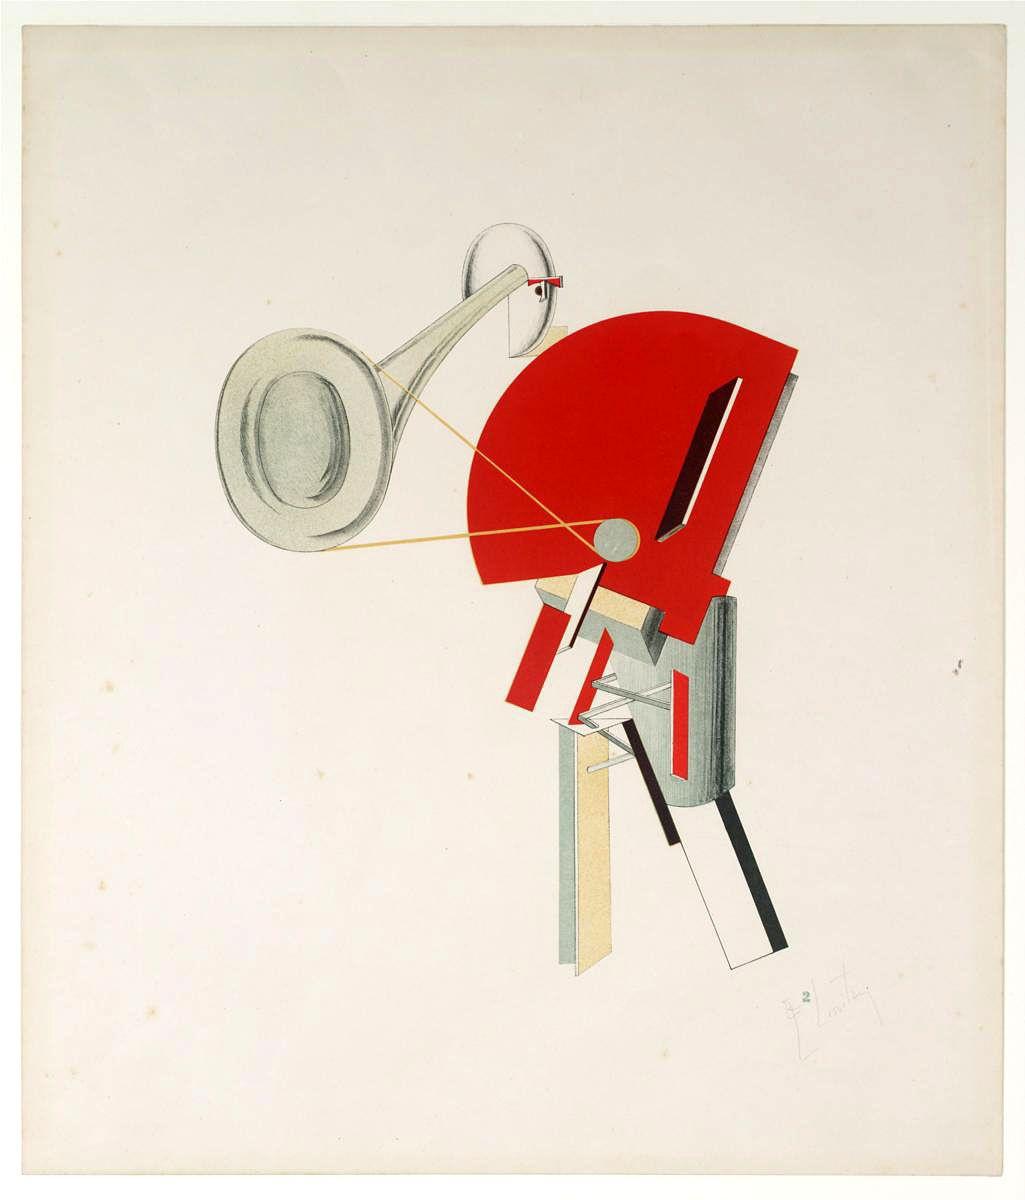 El Lissitzky. Speaker